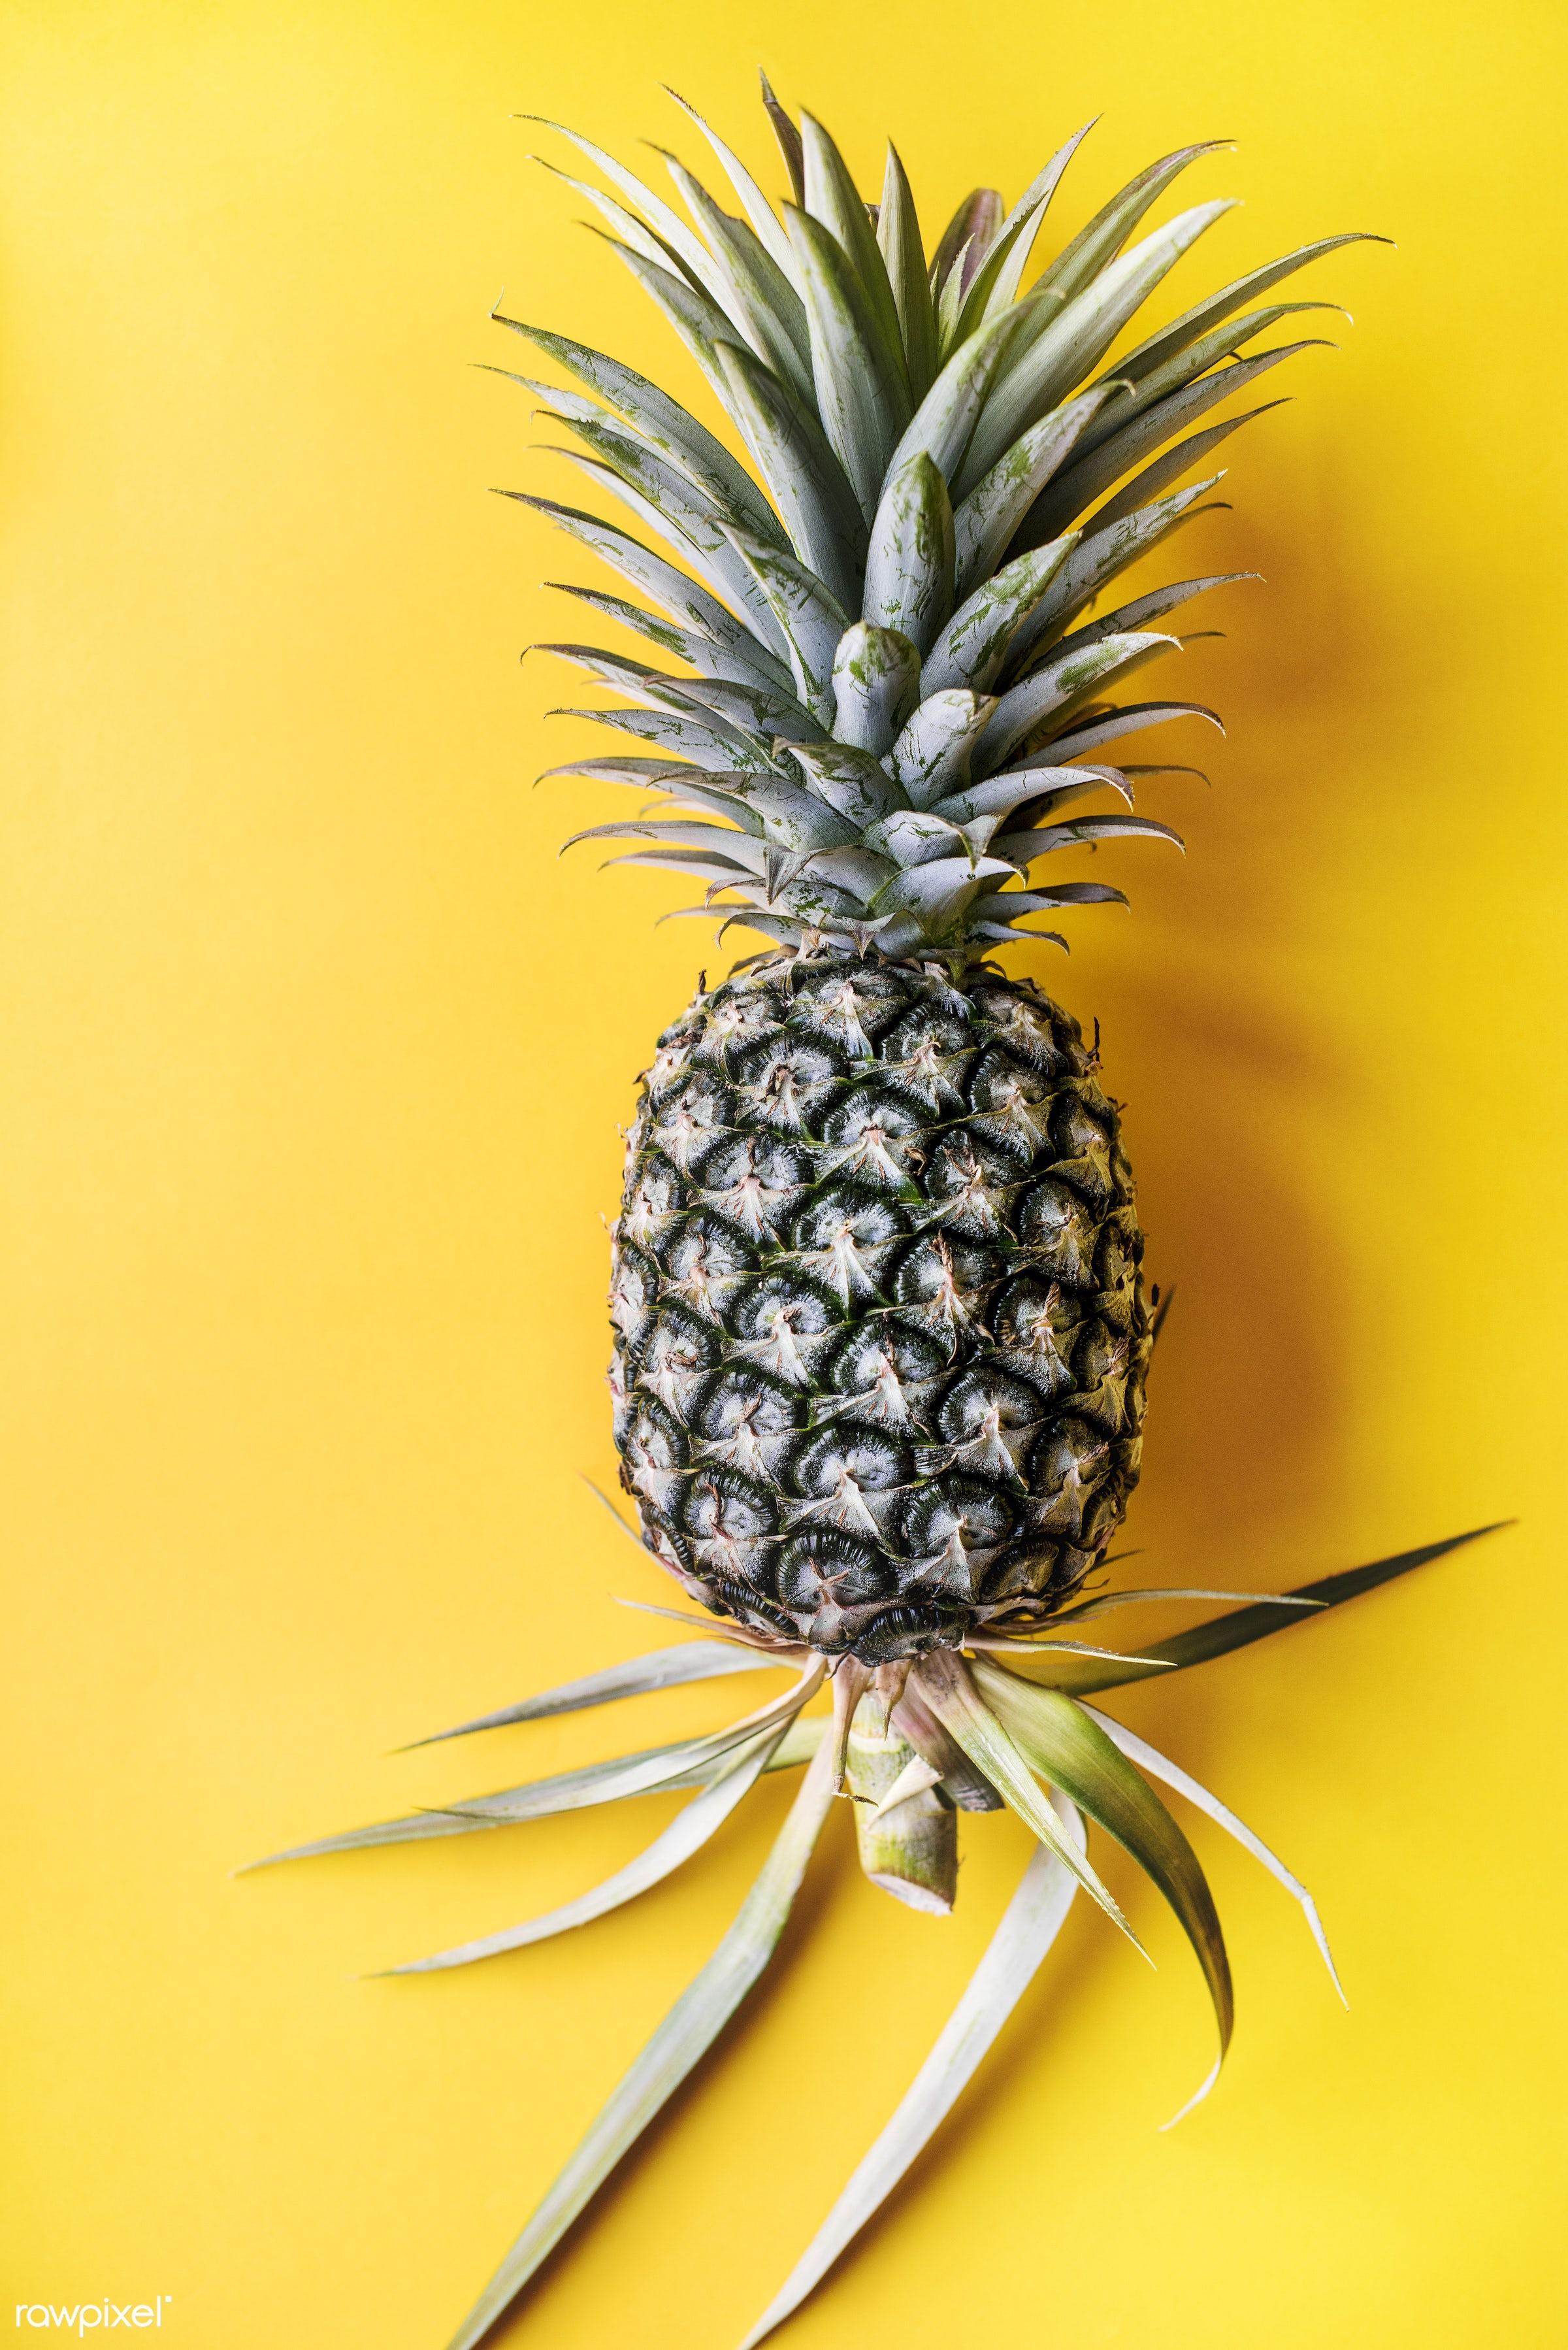 juicy, single, tropical, yellow, hawaiian, fresh, isolated, fruit, fruits, refreshment, health, edible, tasty, nutrition,...